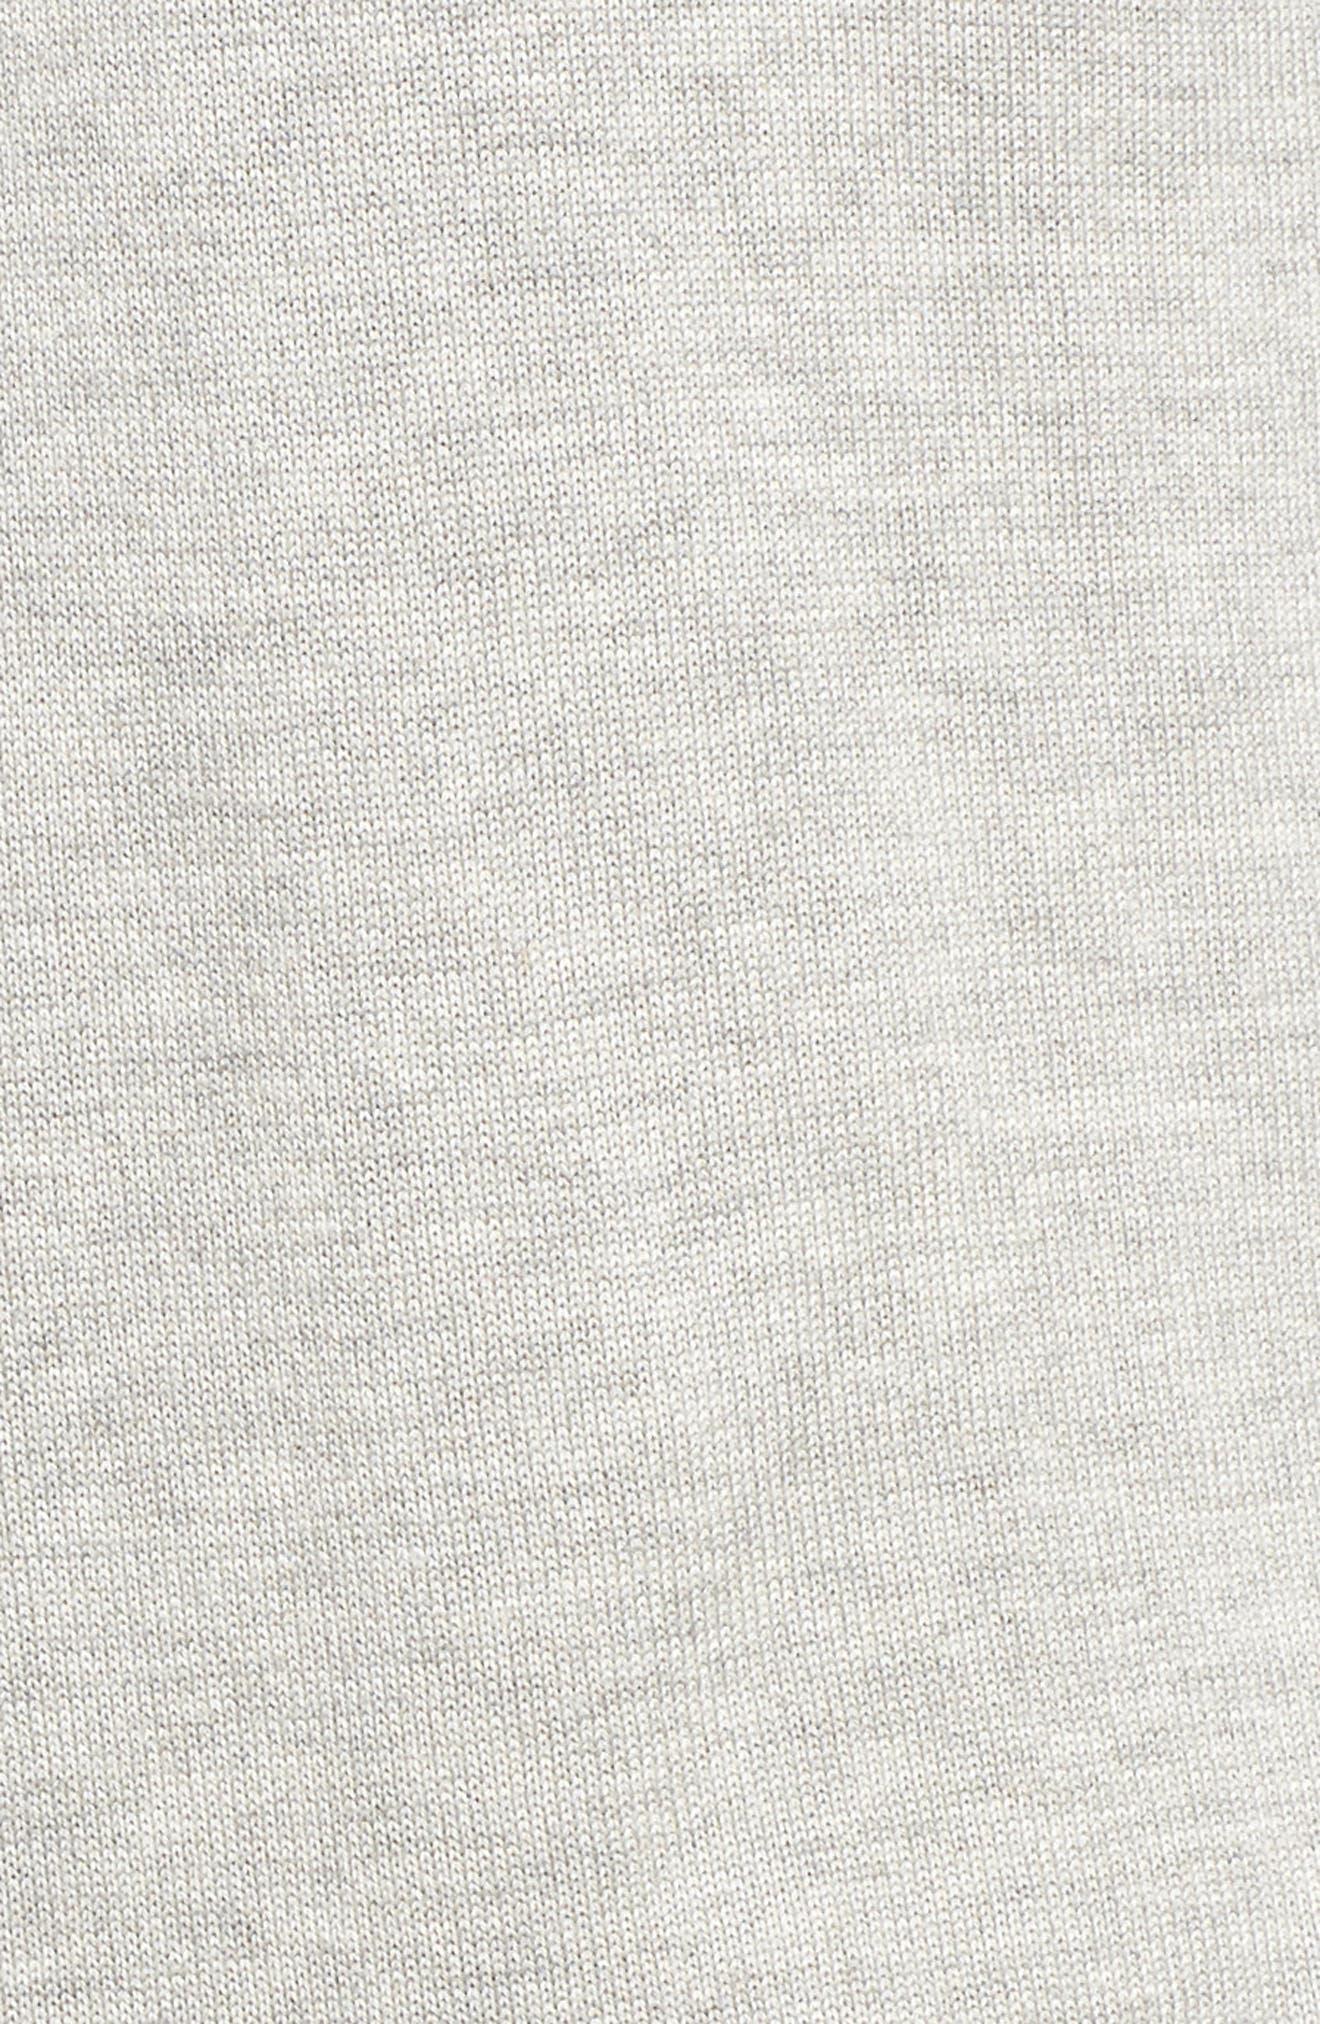 Planes Sweatshirt,                             Alternate thumbnail 5, color,                             Heather Grey/ Heather Grey